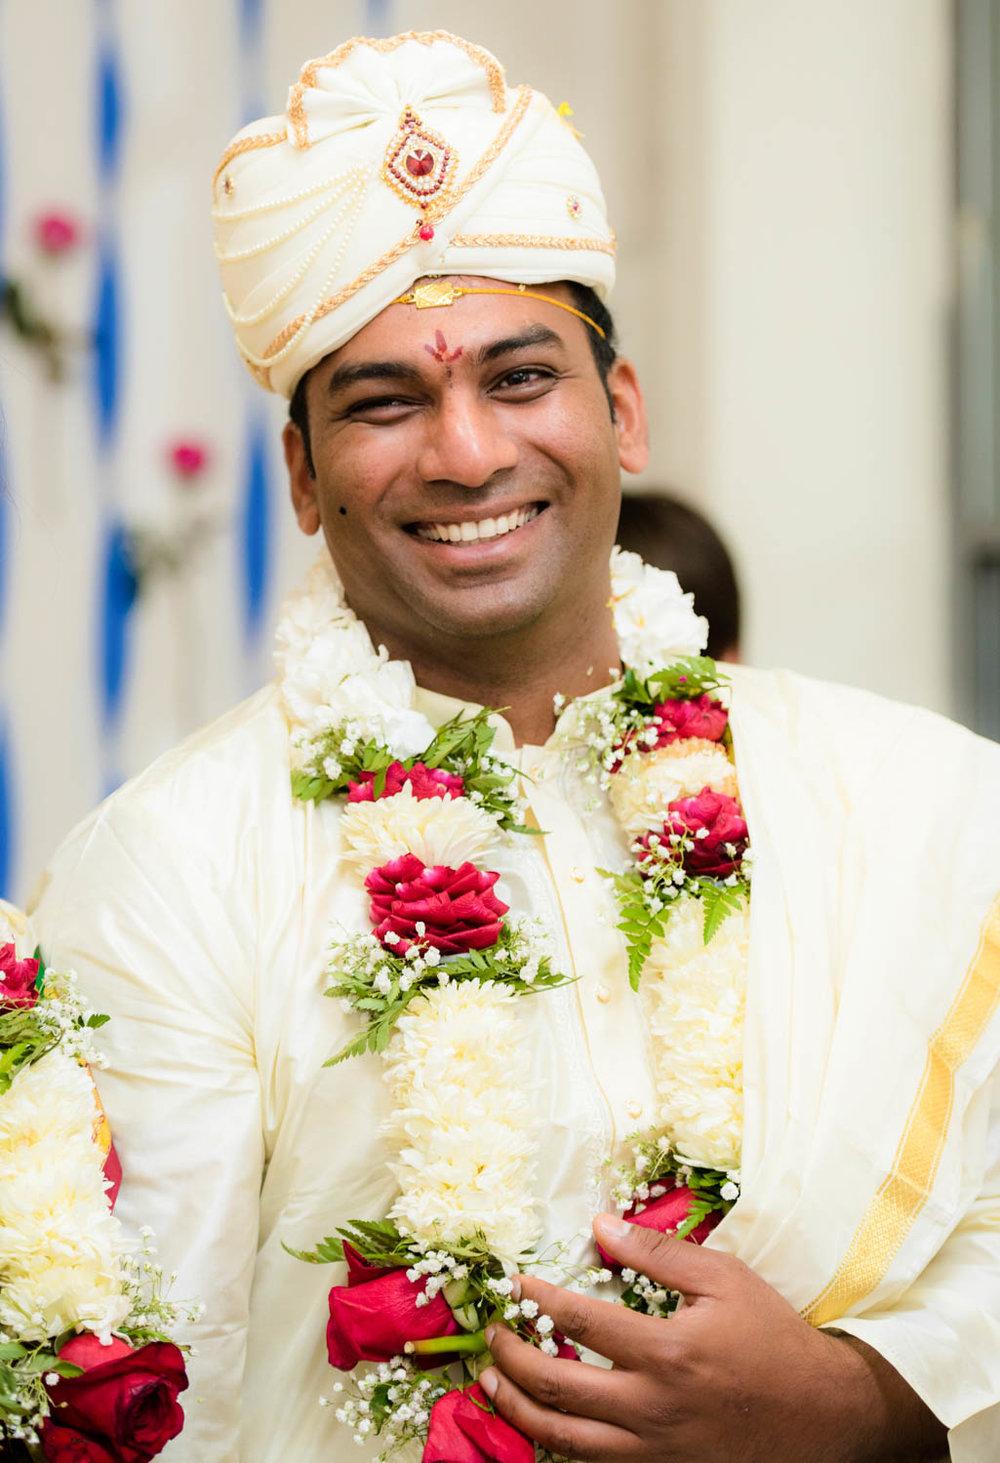 ecaterina-chandu-indian-wedding28.jpg